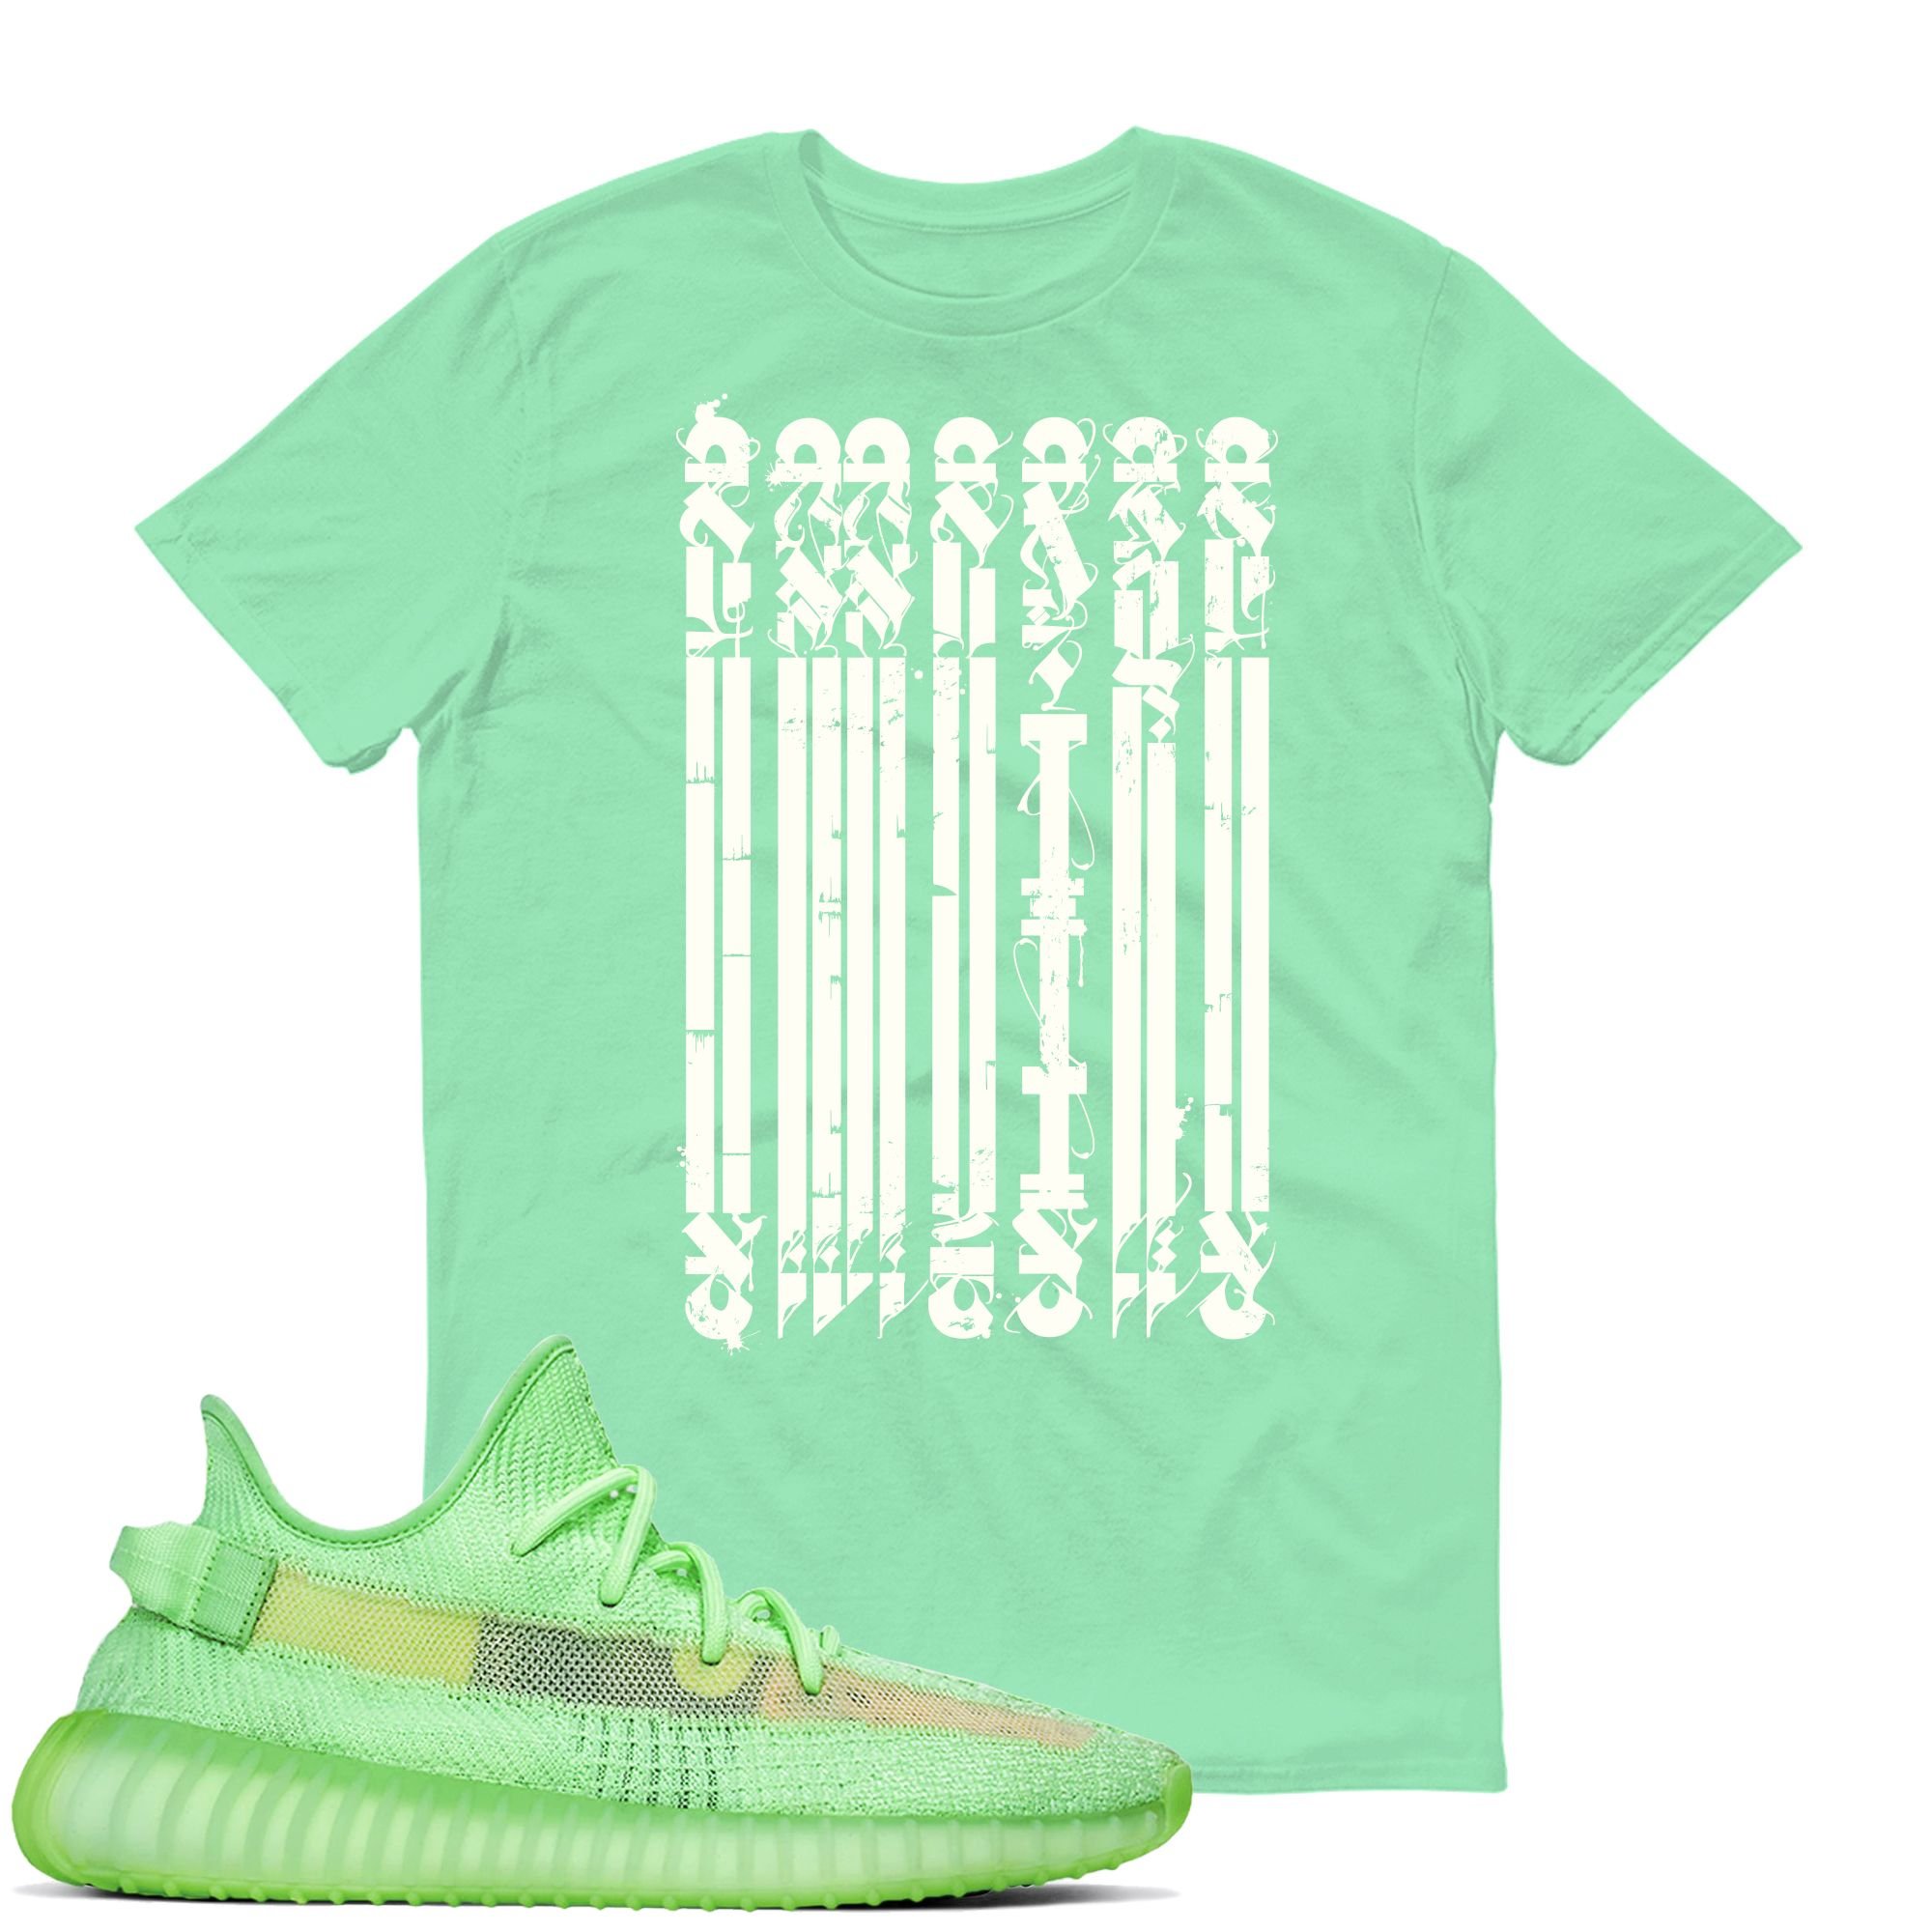 Empire Yeezy Boost 350 V2 Glow T Shirt